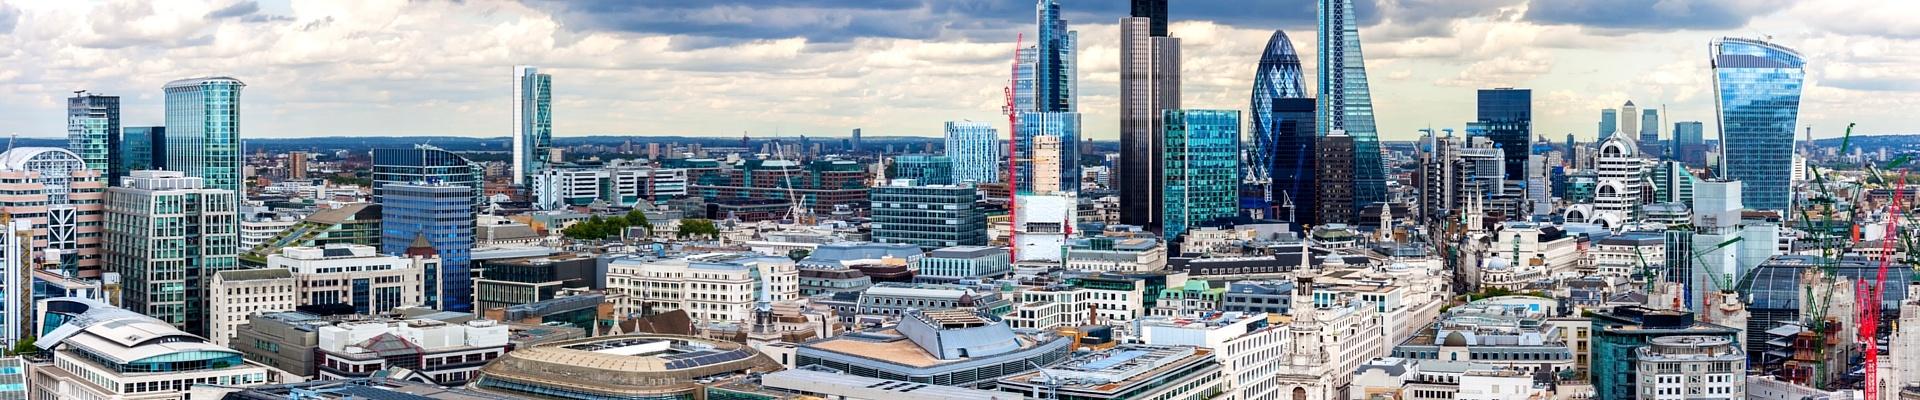 Juriba Headquarters - London, England